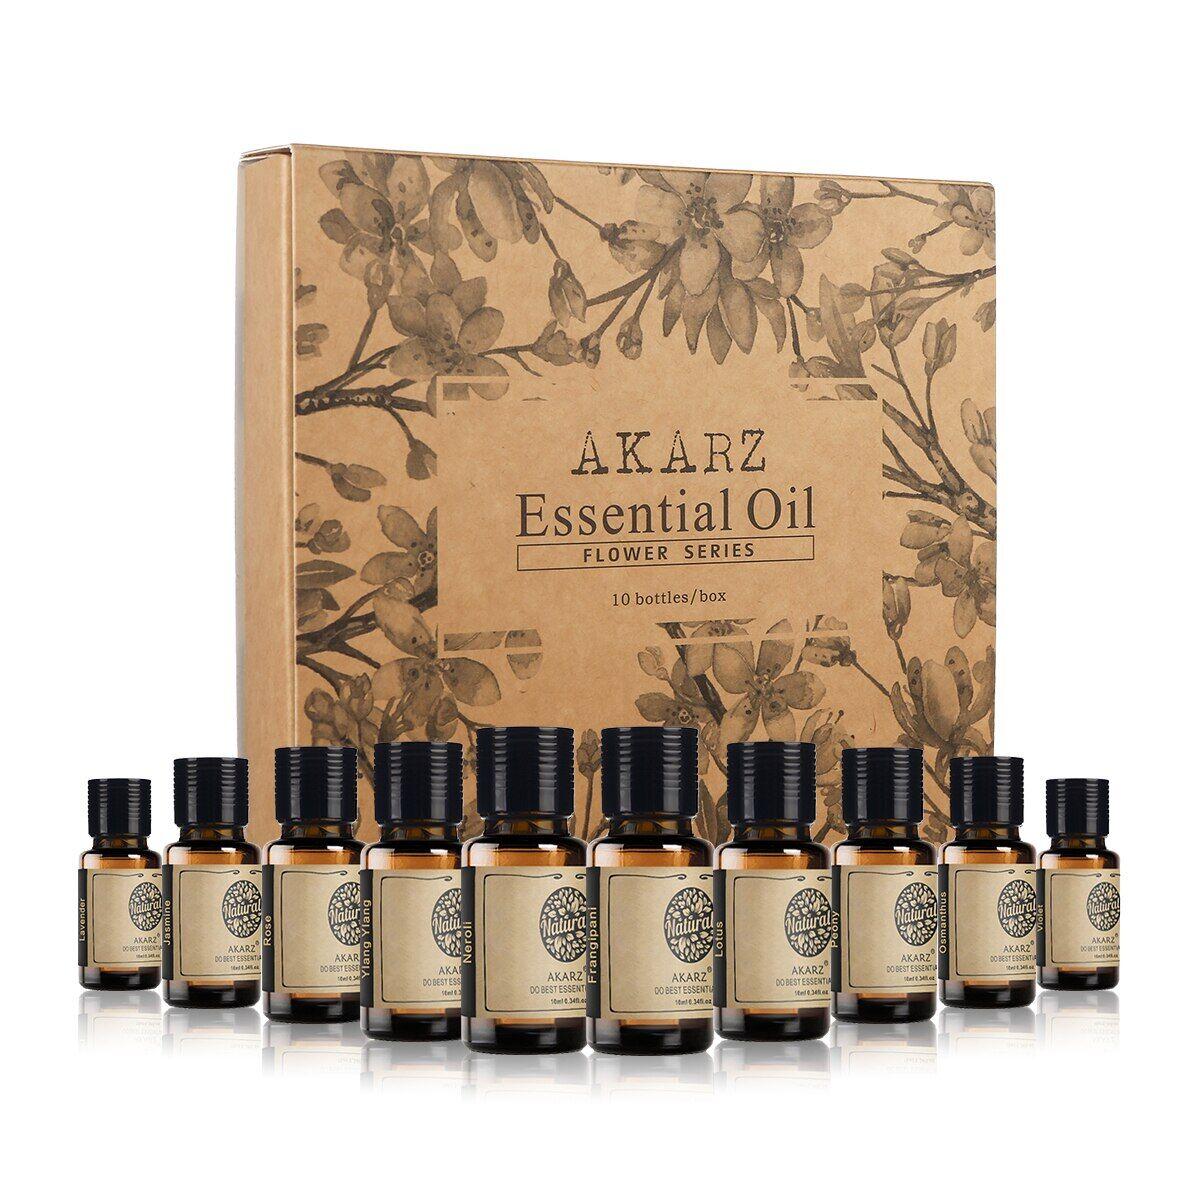 AliExpress AKARZ – lot de 10 huiles essentielles, série fleur, lavande, jasmin, Rose, Ylang, Neroli,